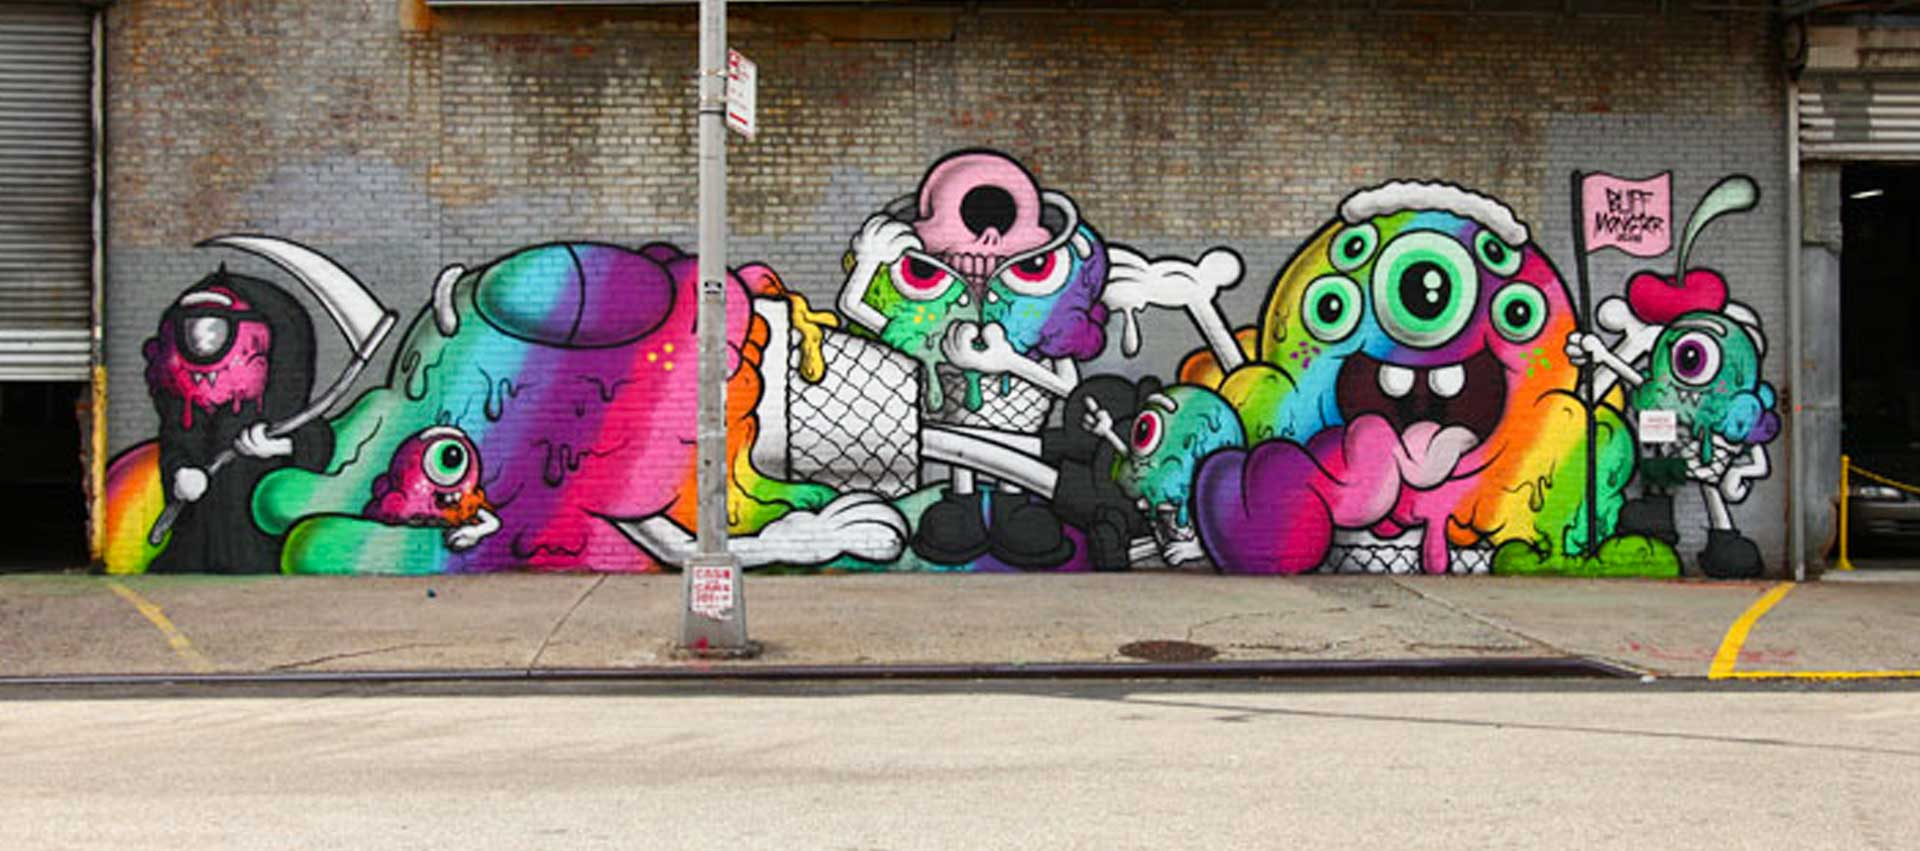 street art in South Africa